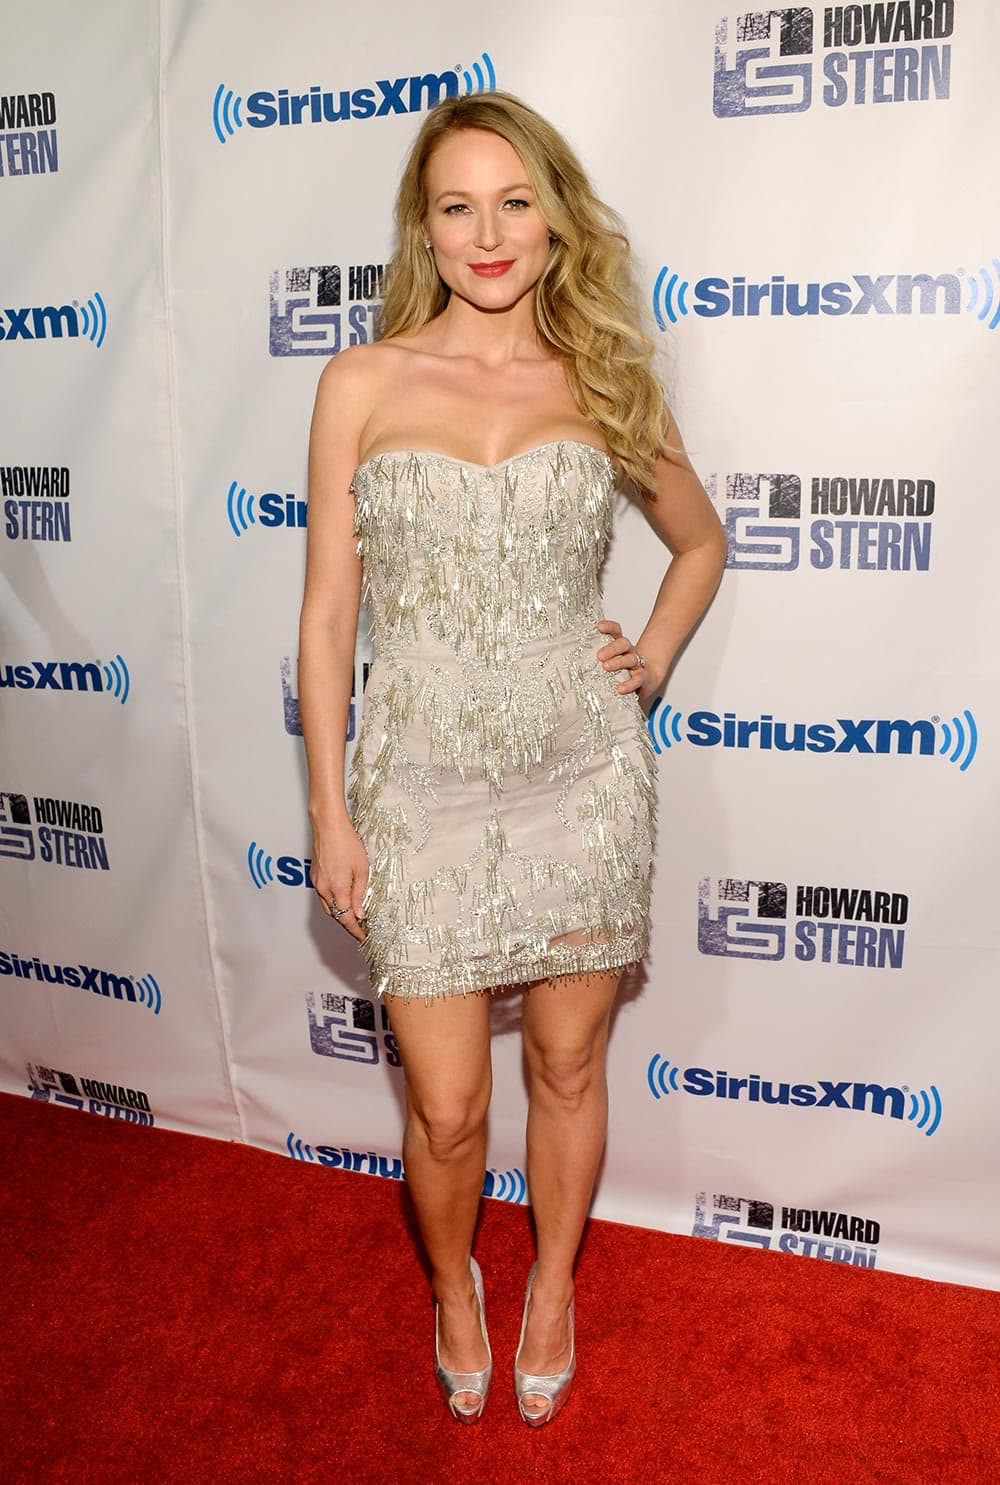 Singer Jewel Kilcher attends 'Howard Stern's Birthday Bash,' presented by SiriusXM, at the Hammerstein Ballroom, in New York.